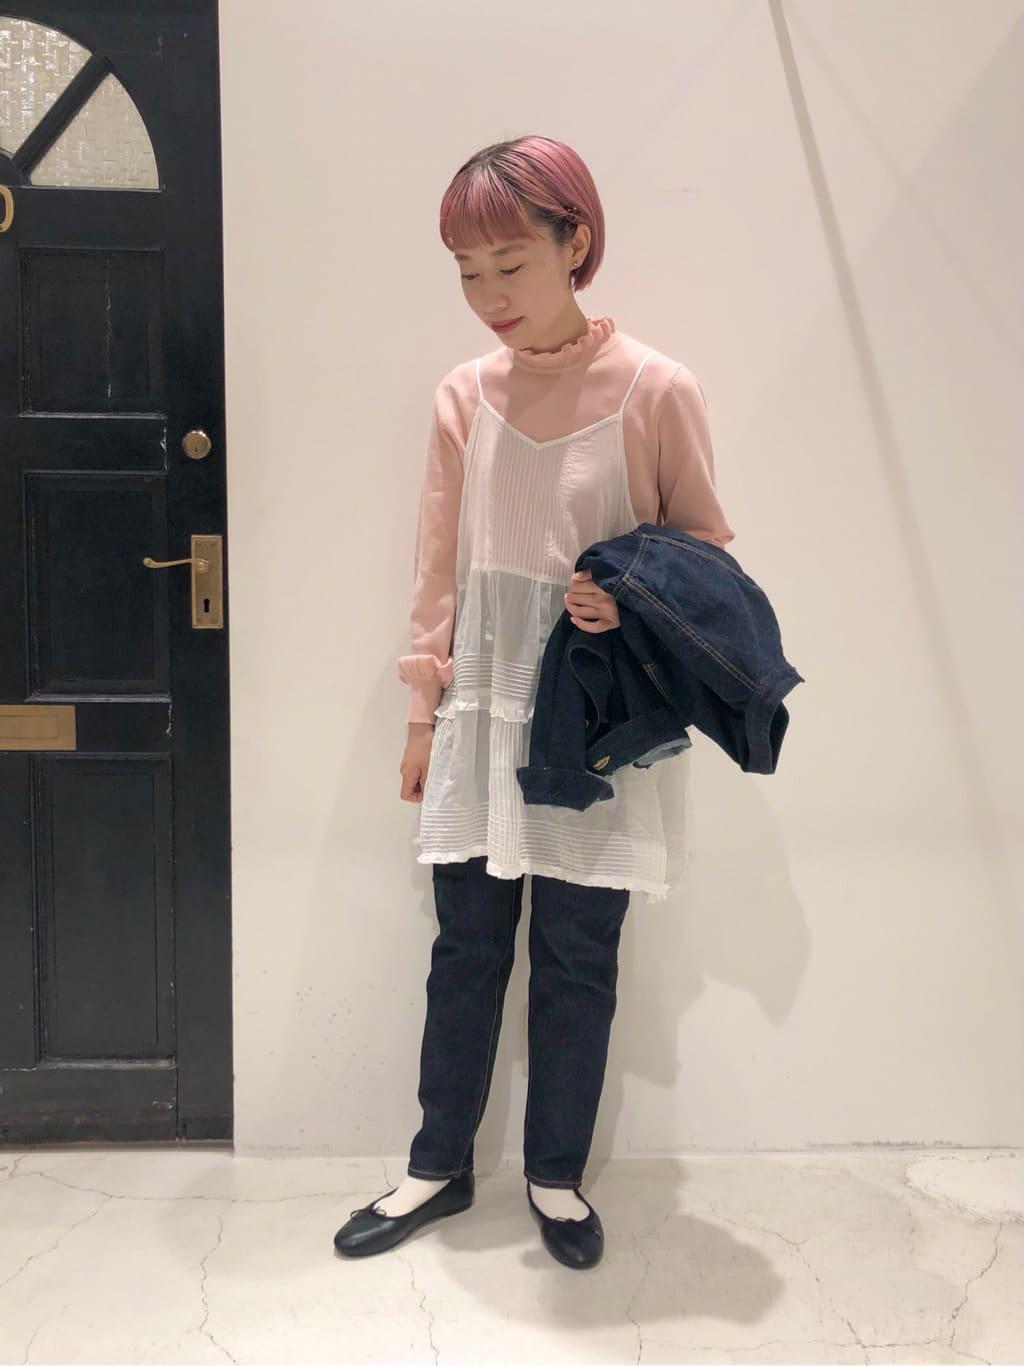 Dot and Stripes CHILD WOMAN ルクアイーレ 身長:157cm 2021.09.26